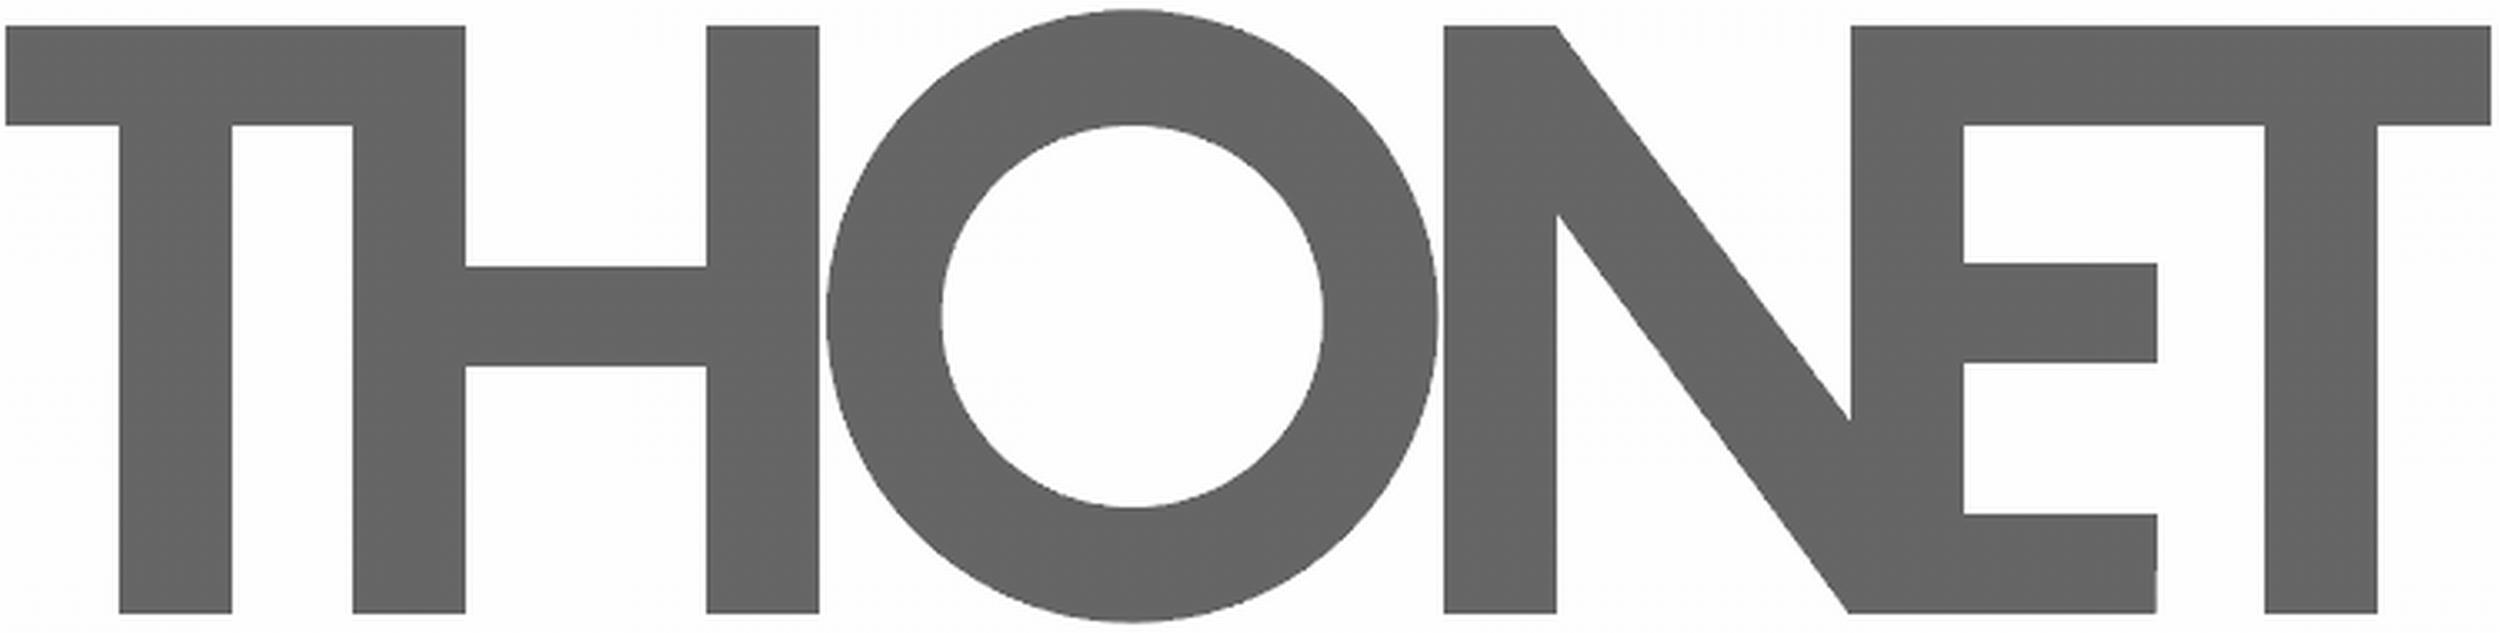 thonet-logo.jpg